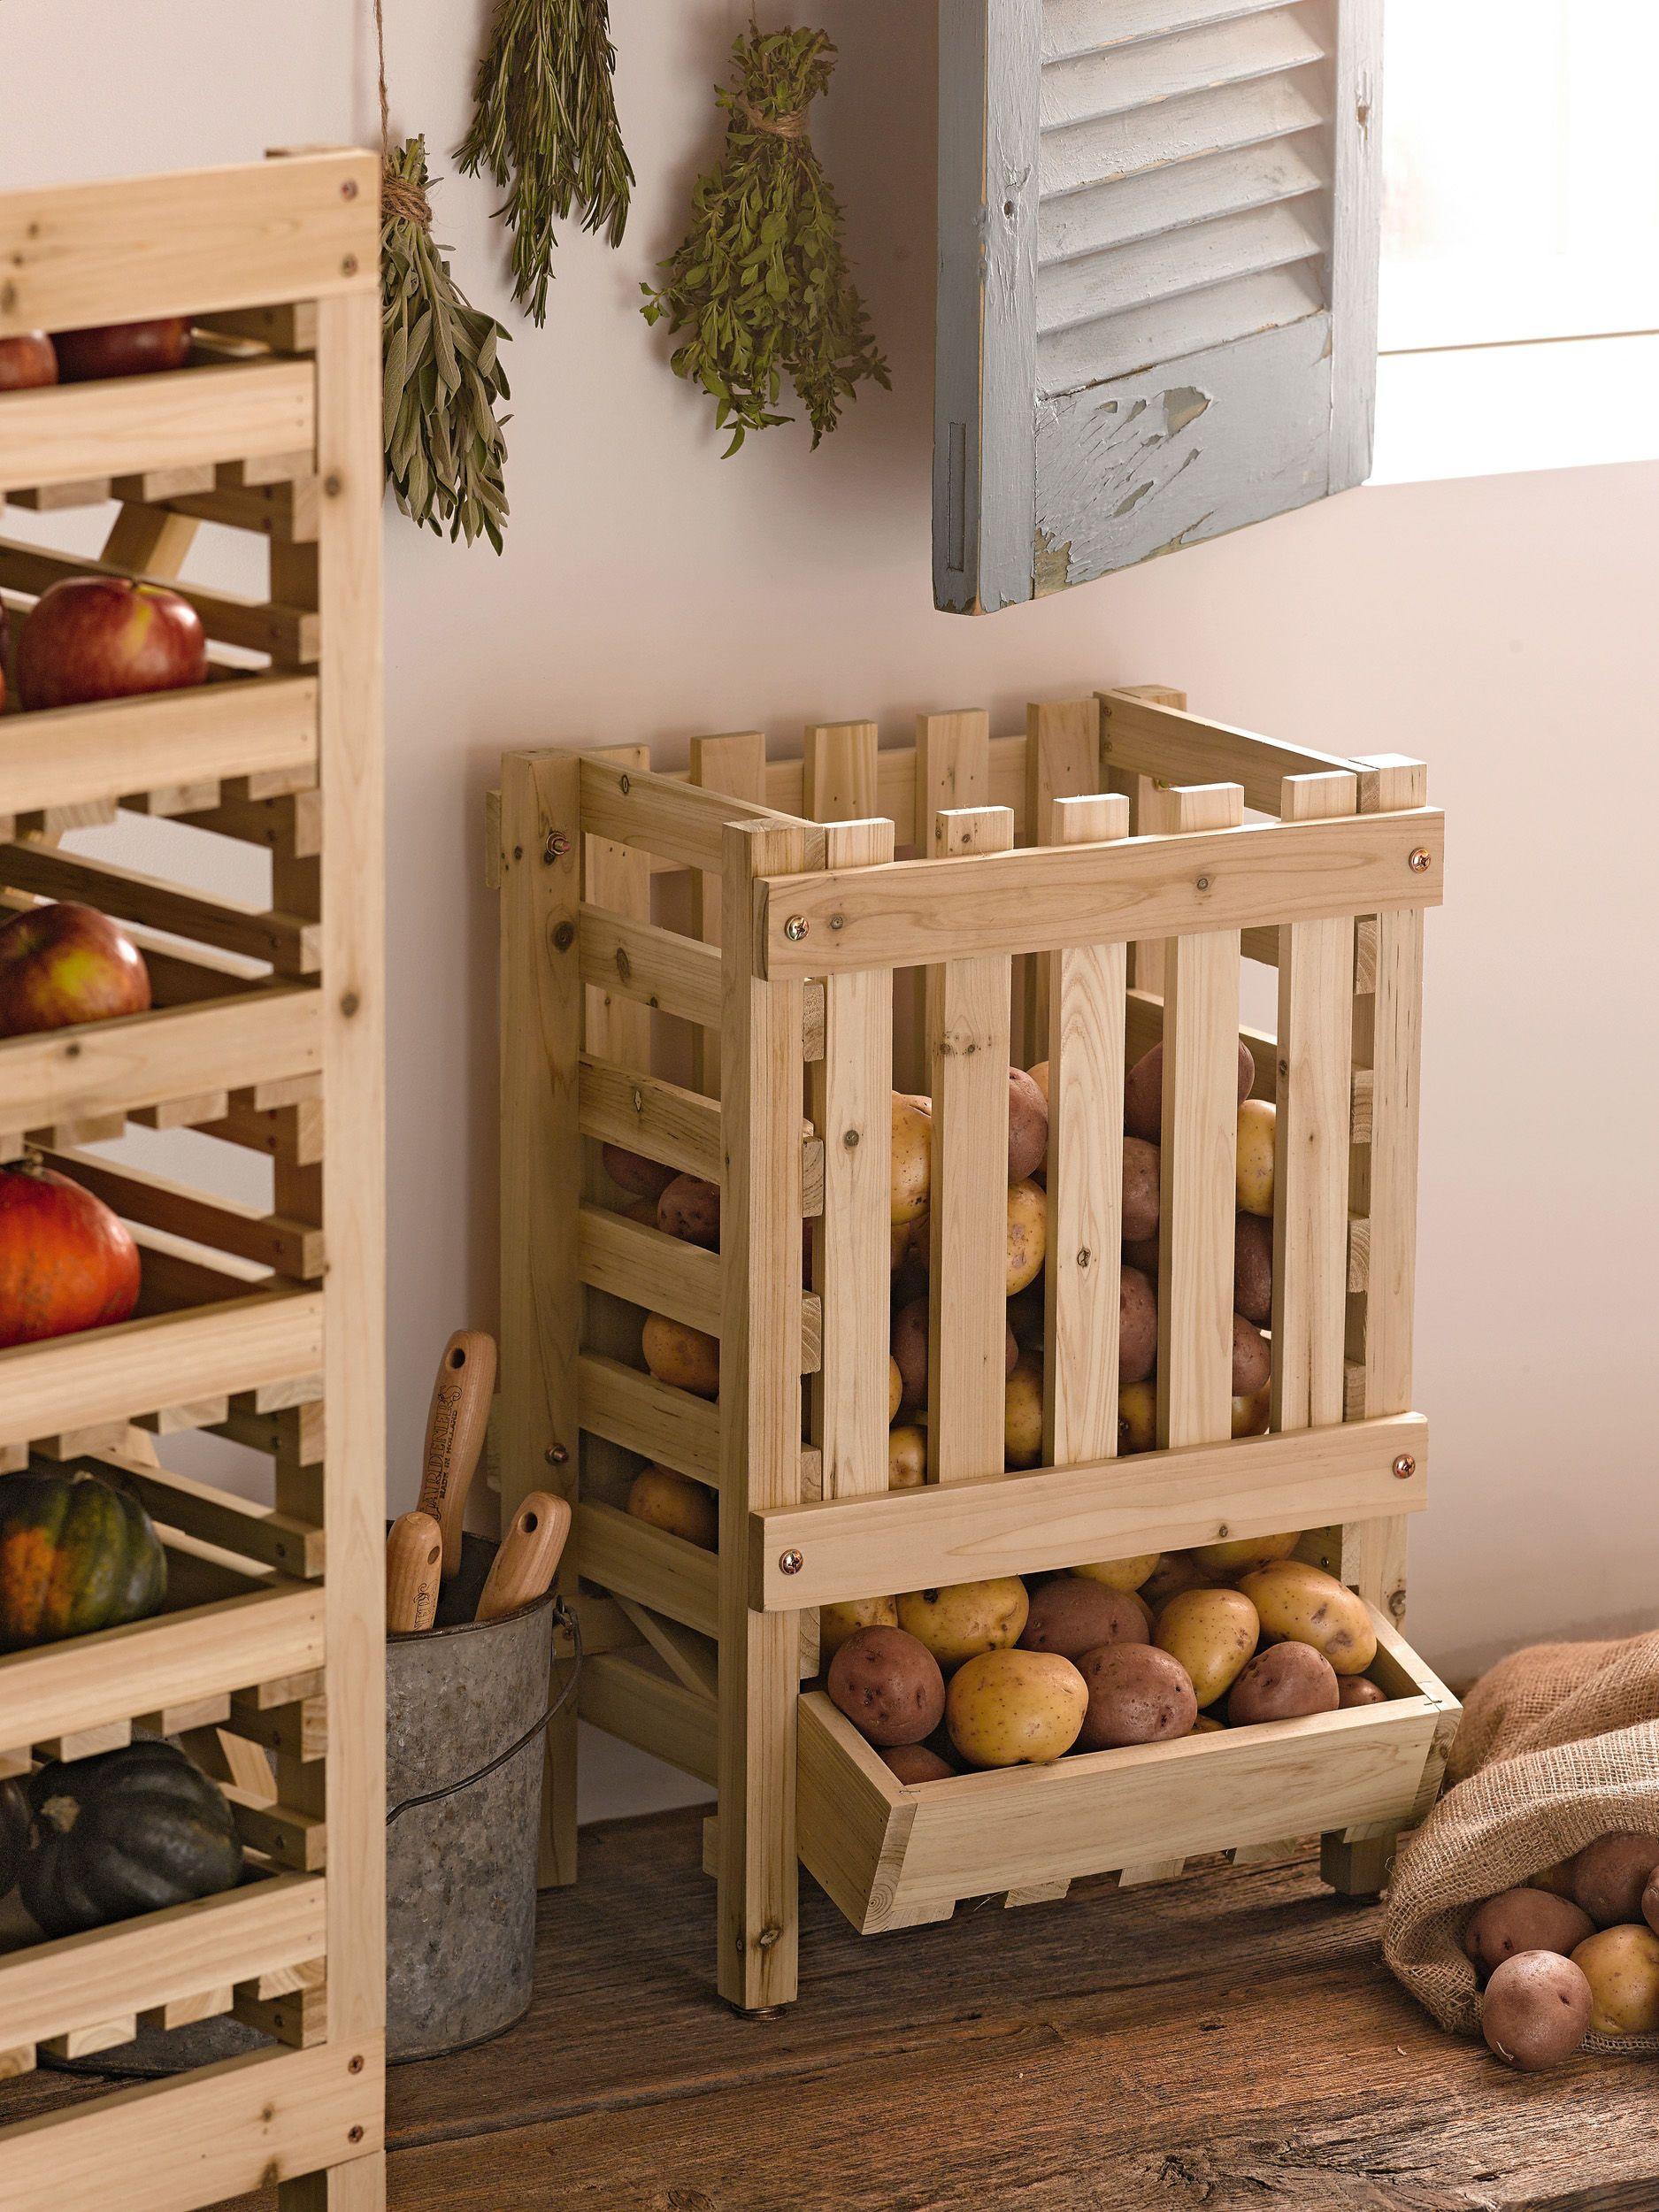 range pomme de terre id e maison pinterest ikea. Black Bedroom Furniture Sets. Home Design Ideas